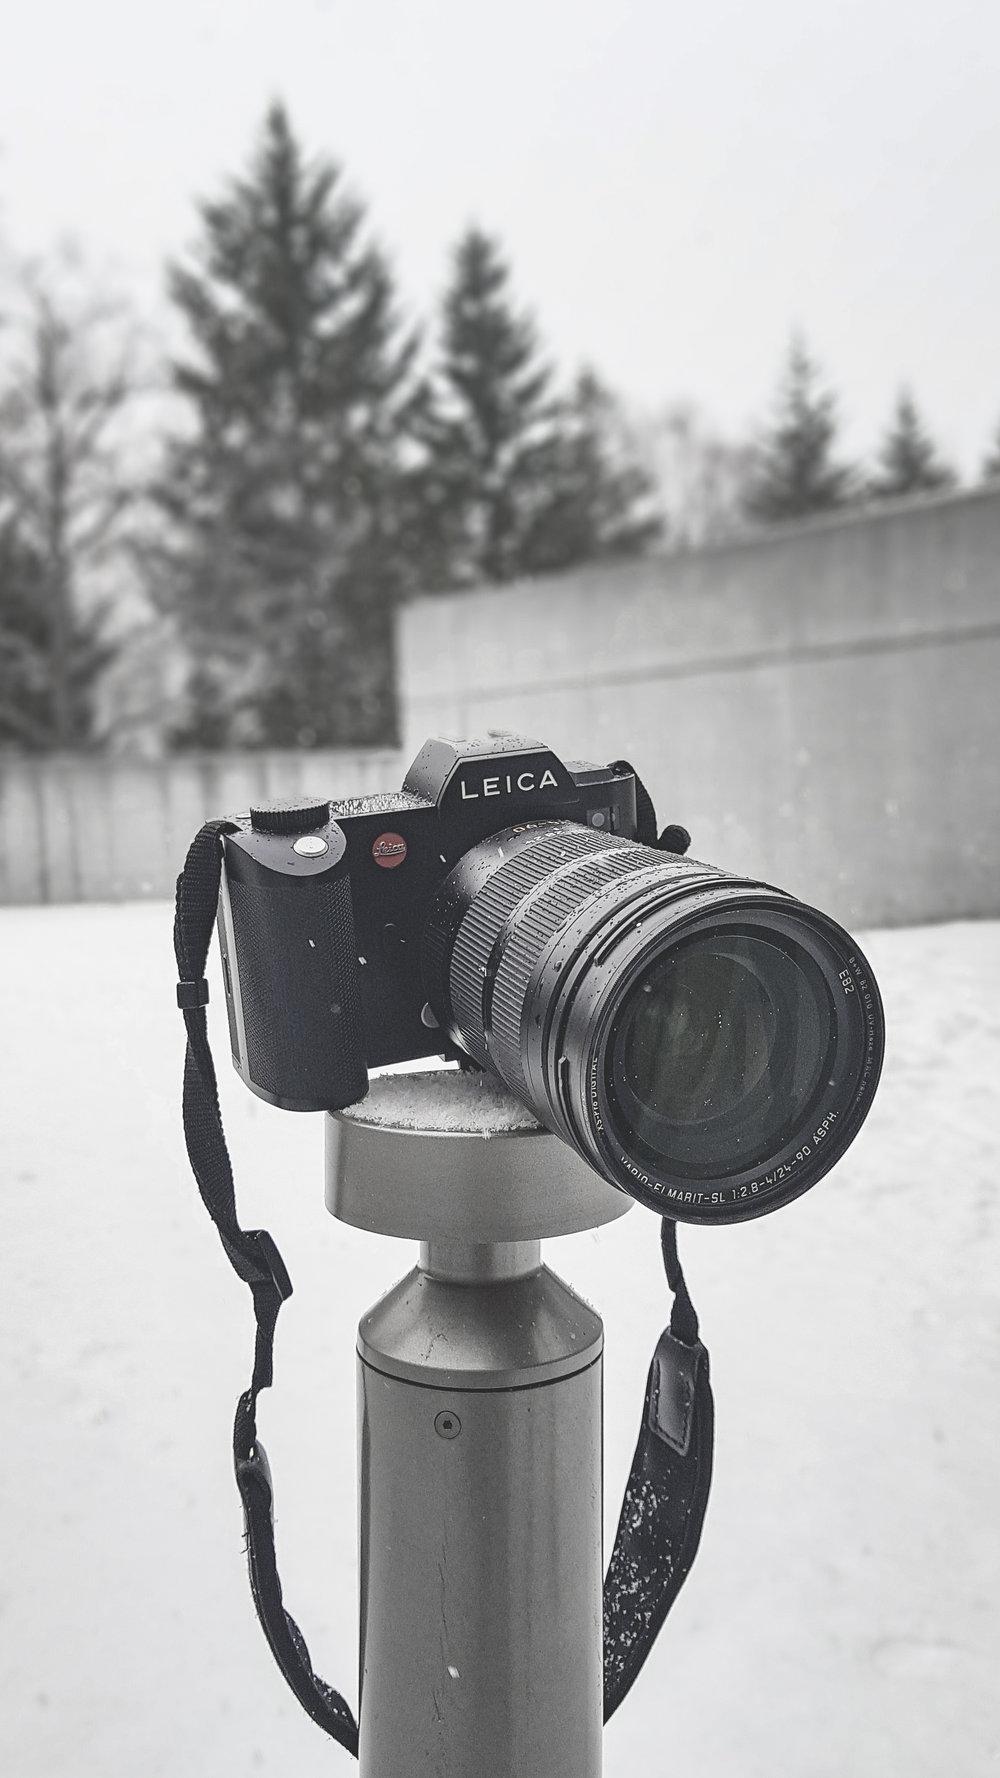 Leica_SL_ERICCHENRR_12a.jpg